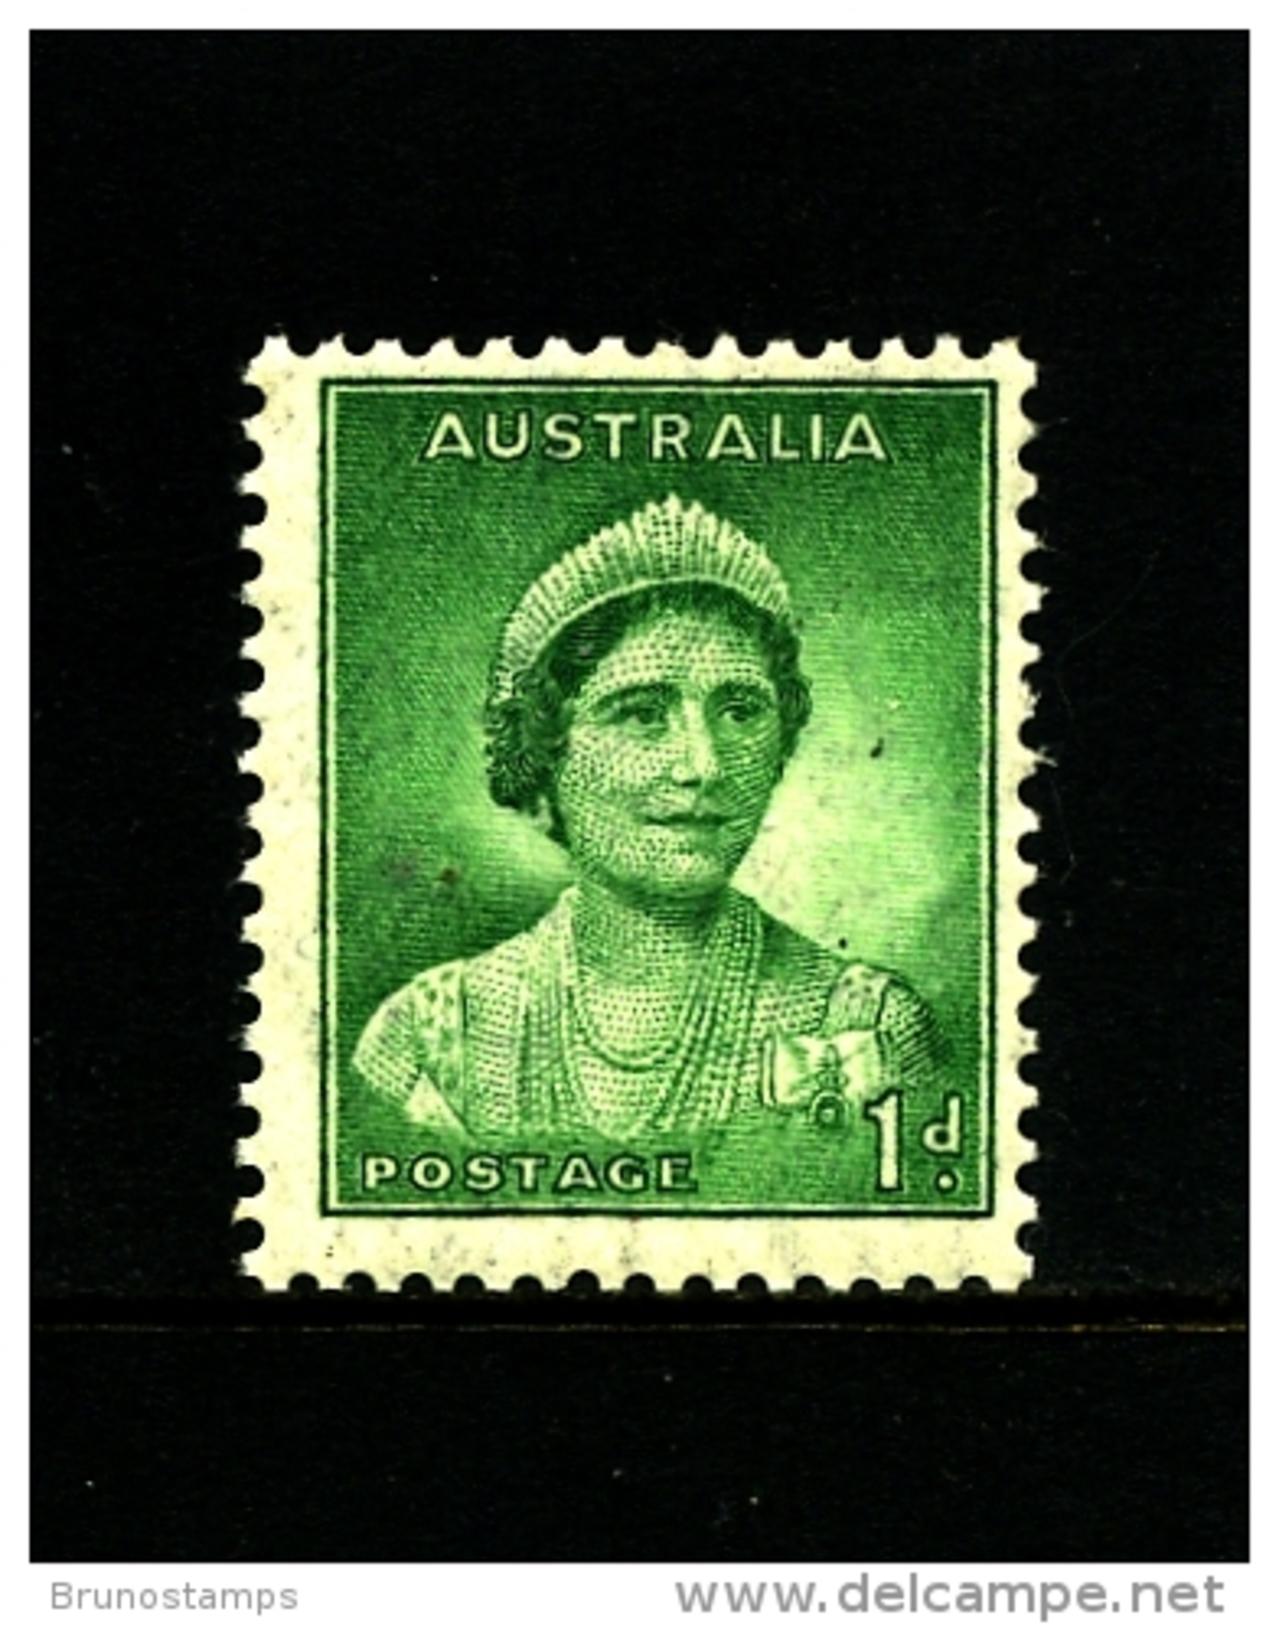 AUSTRALIA - 1938  DEFINITIVE  1d  GREEN  WMK  PERF. 14 X 15  MINT NH  SG 180 - 1937-52 George VI